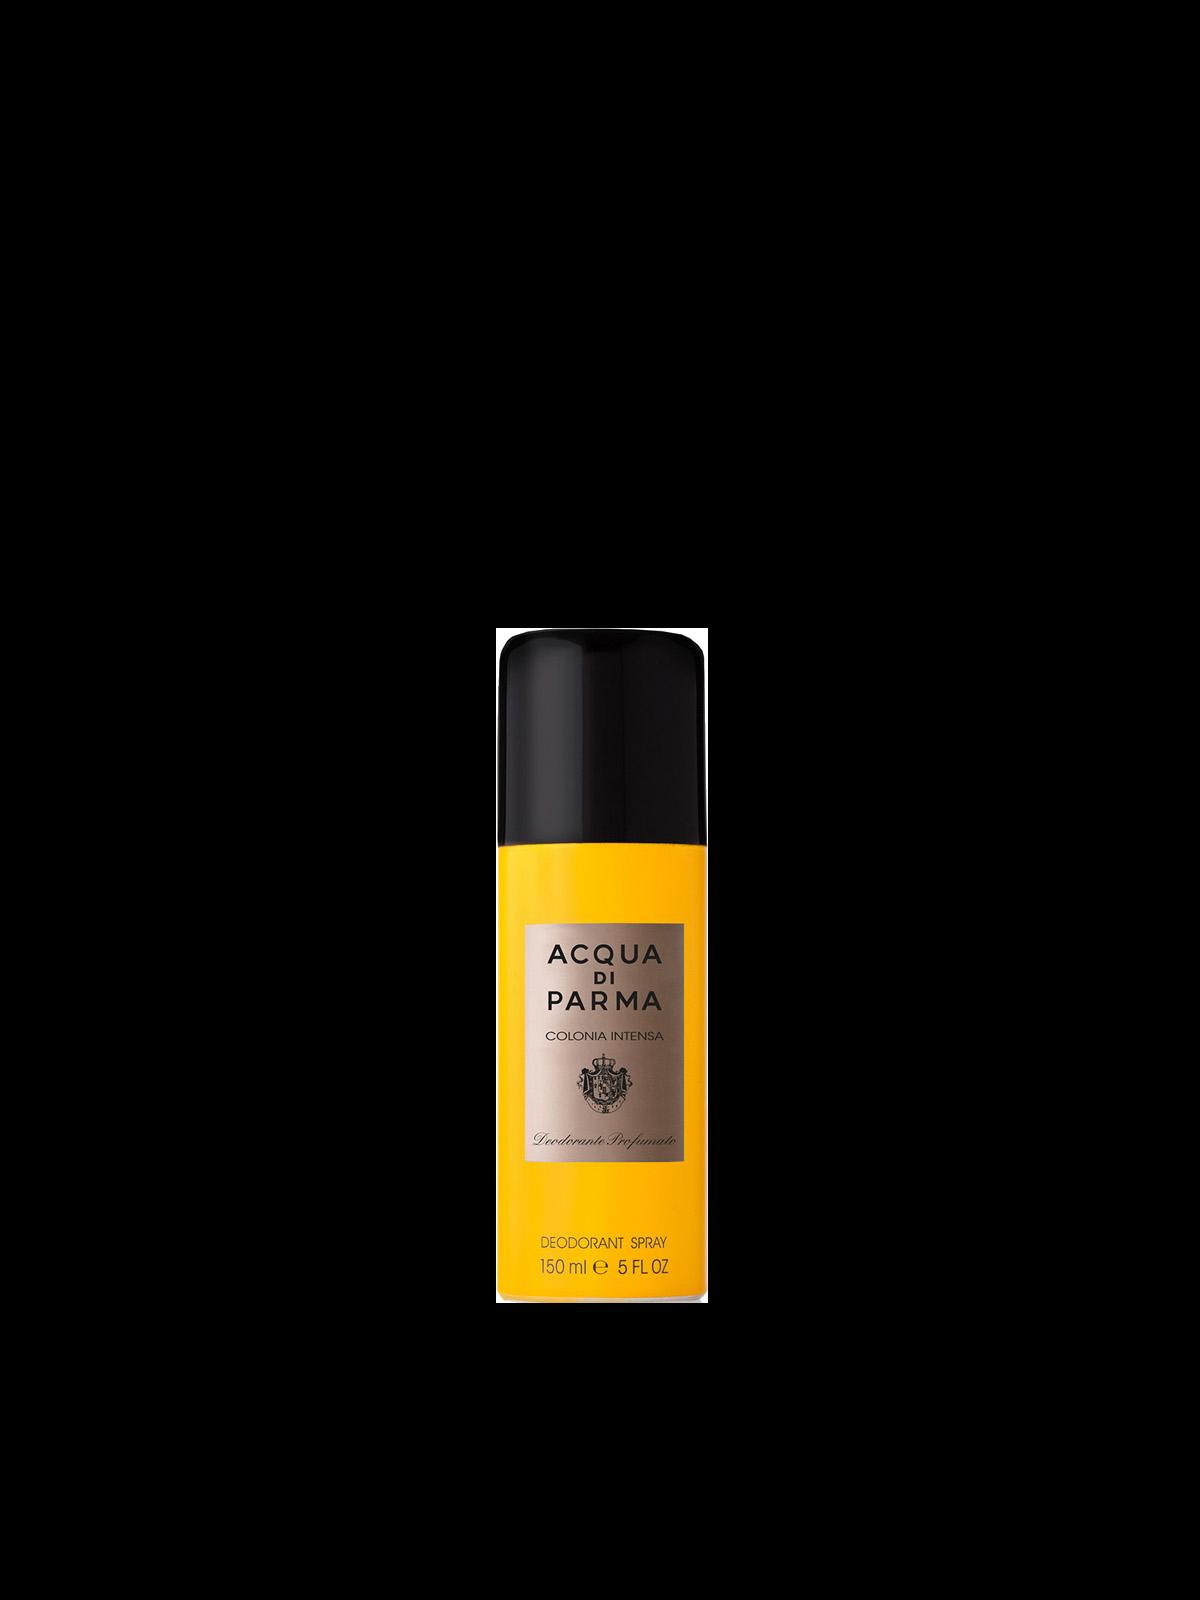 Colonia Intensa Deodorant Spray 150ml